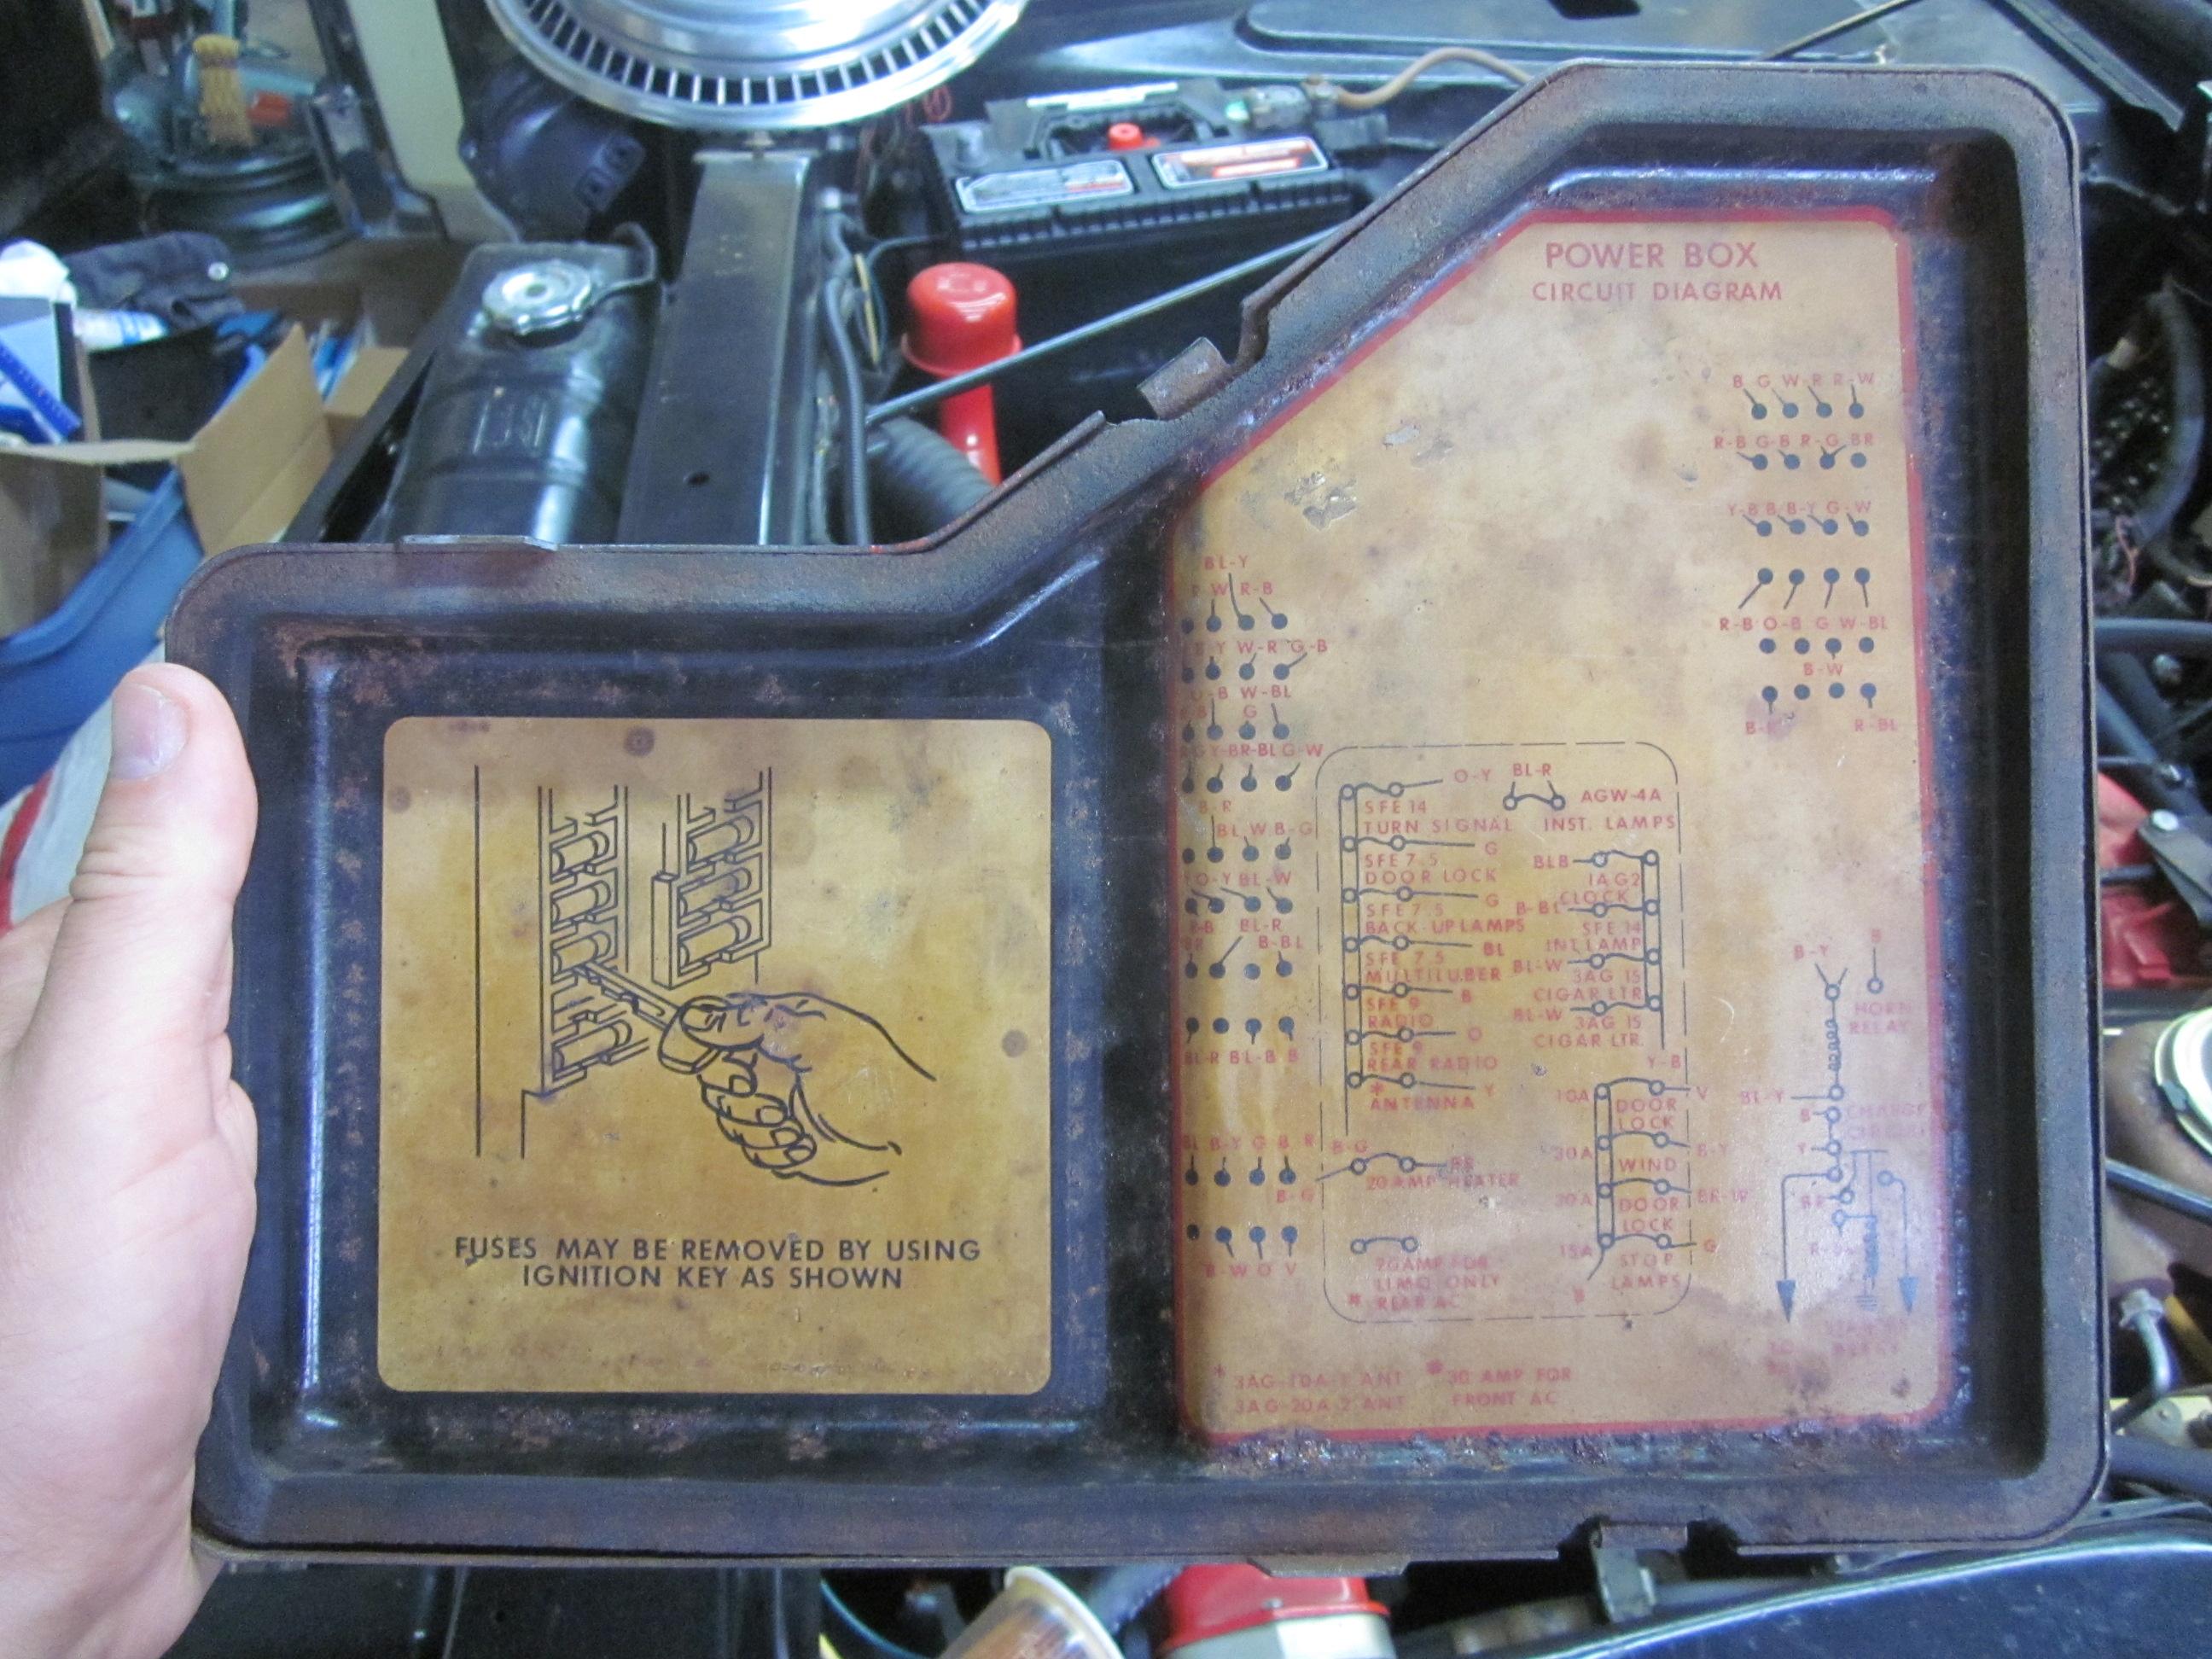 1969 Ford Thunderbird Fuse Box Wiring Diagram View A View A Zaafran It